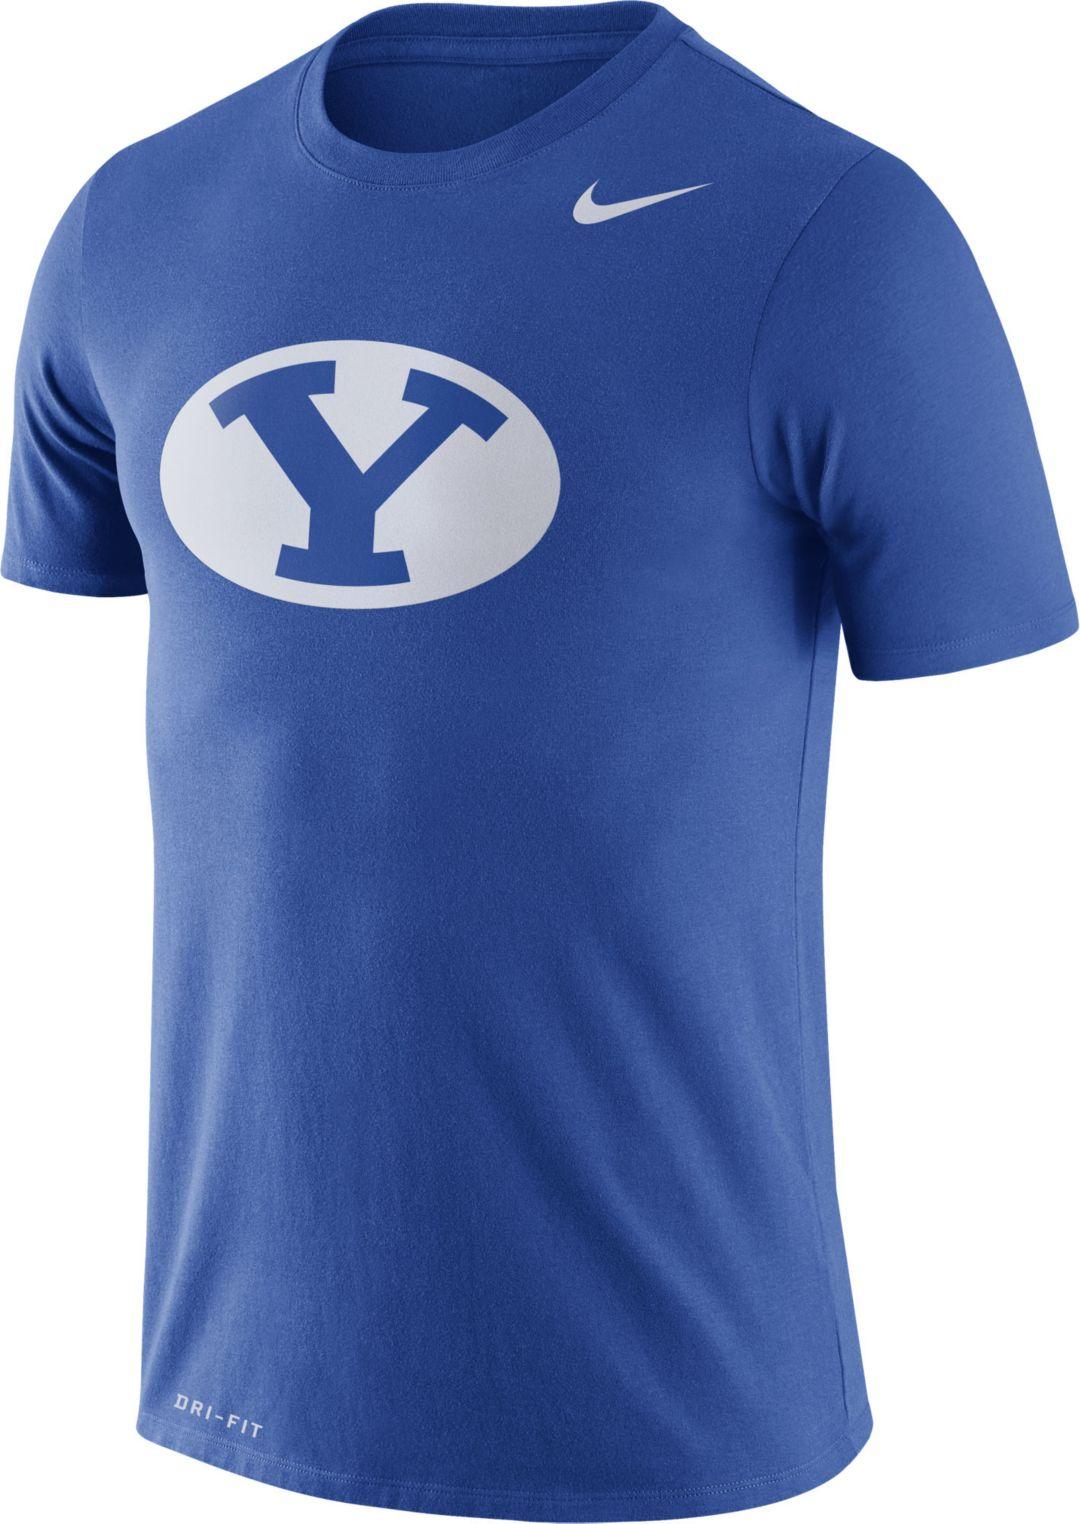 quality design 5fc92 33509 Nike Men's BYU Cougars Blue Logo Dry Legend T-Shirt